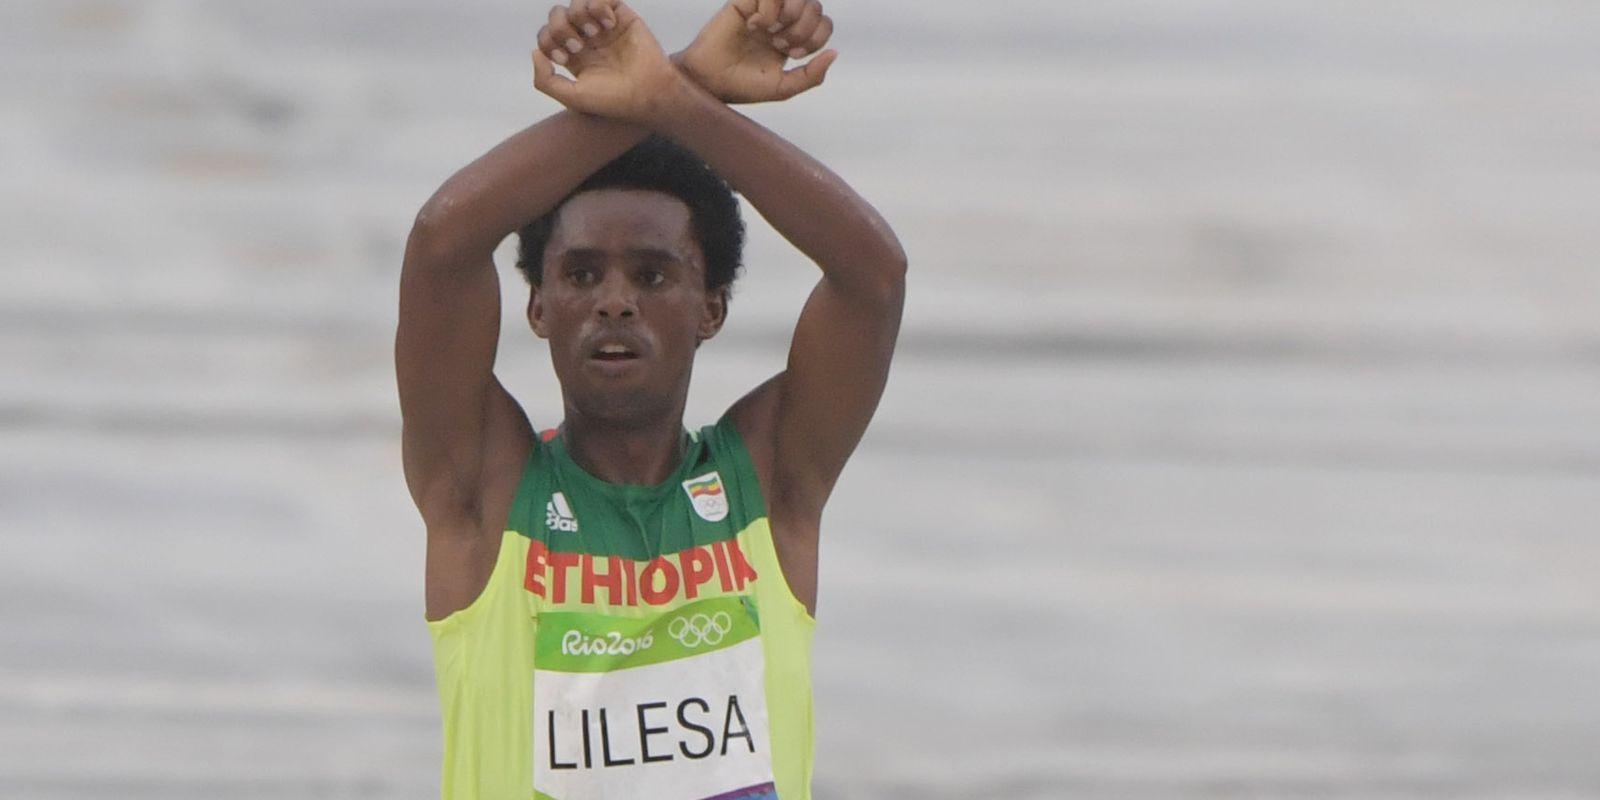 Feyisa Lilesa hero of Rio de Janeiro 2016 Olympics